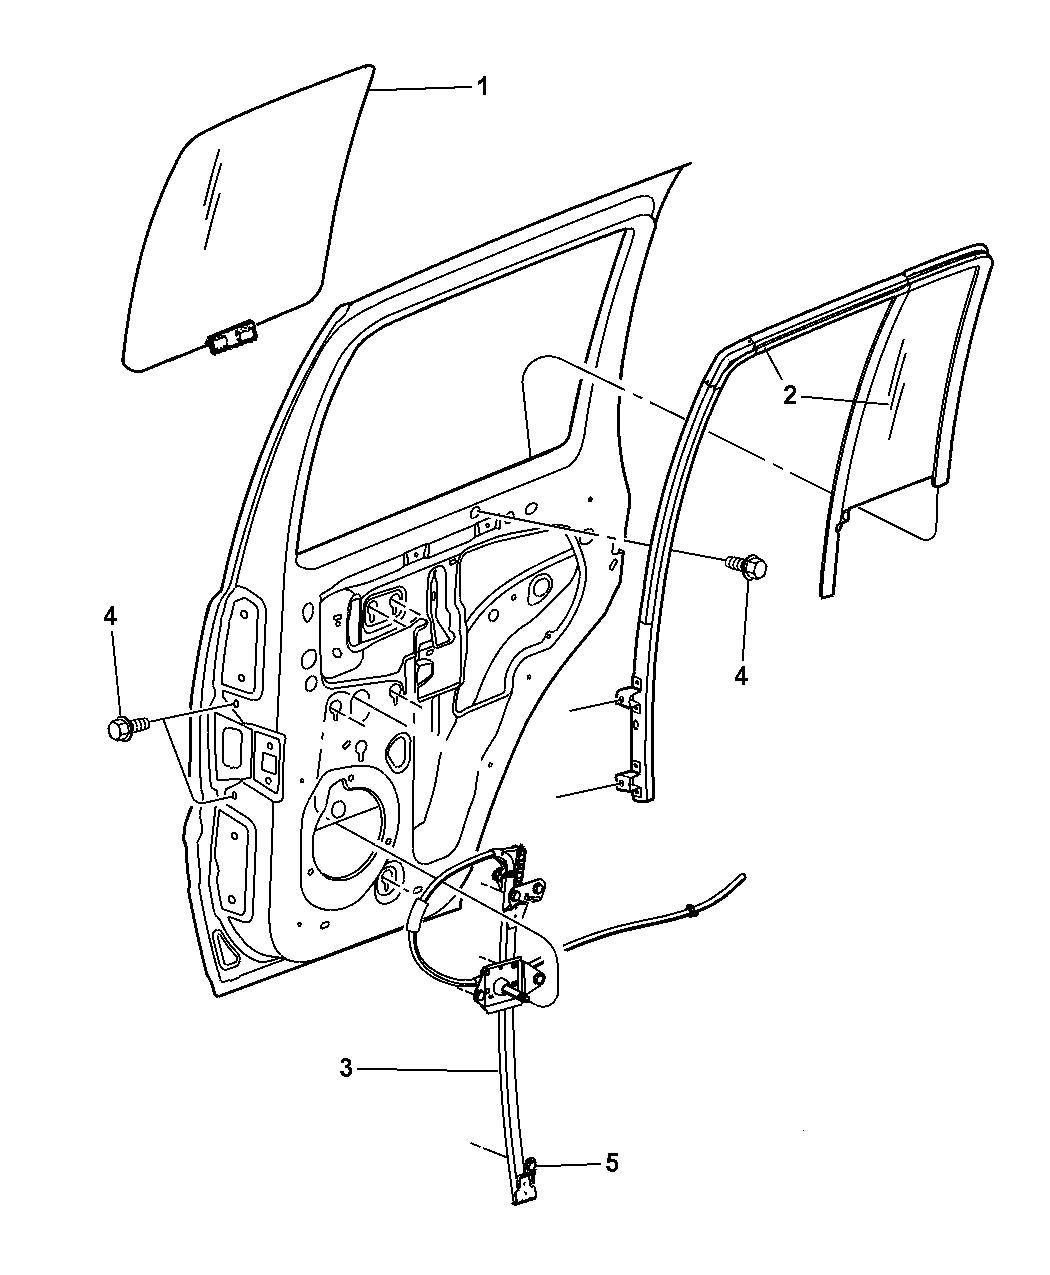 2006 jeep liberty oem parts